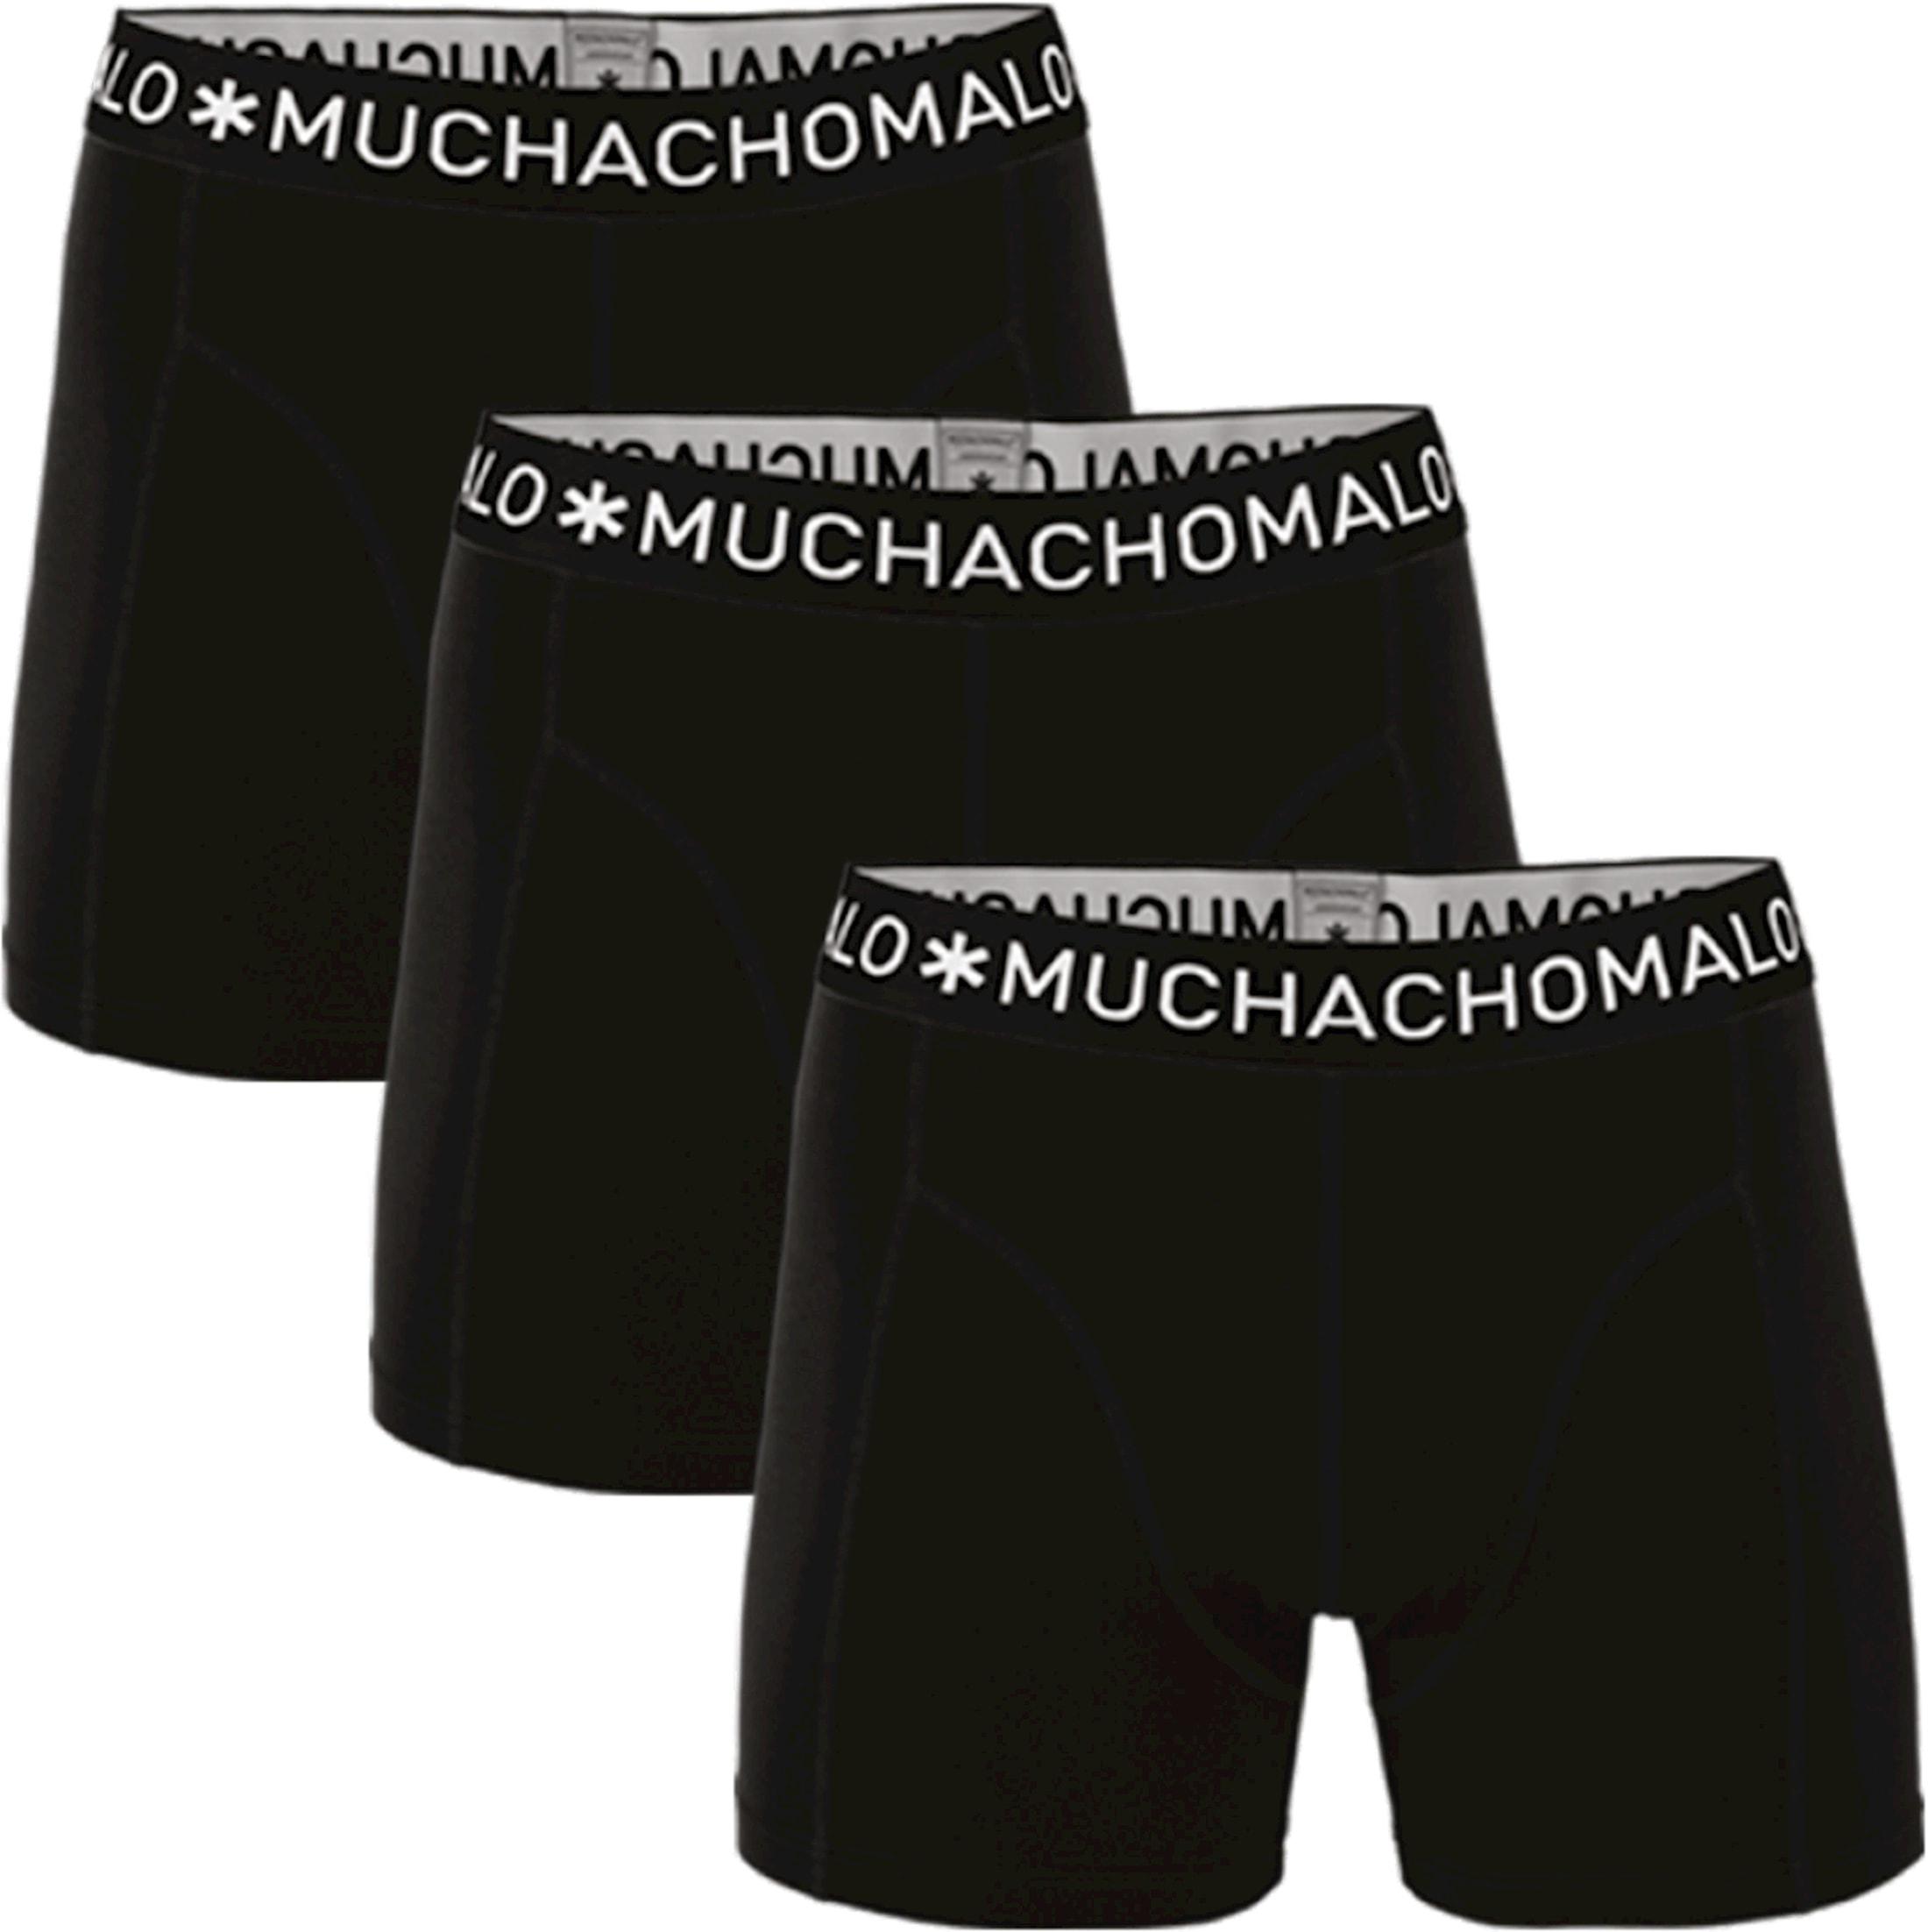 Muchachomalo Boxershorts 3er-Pack Schwarz 185 foto 0